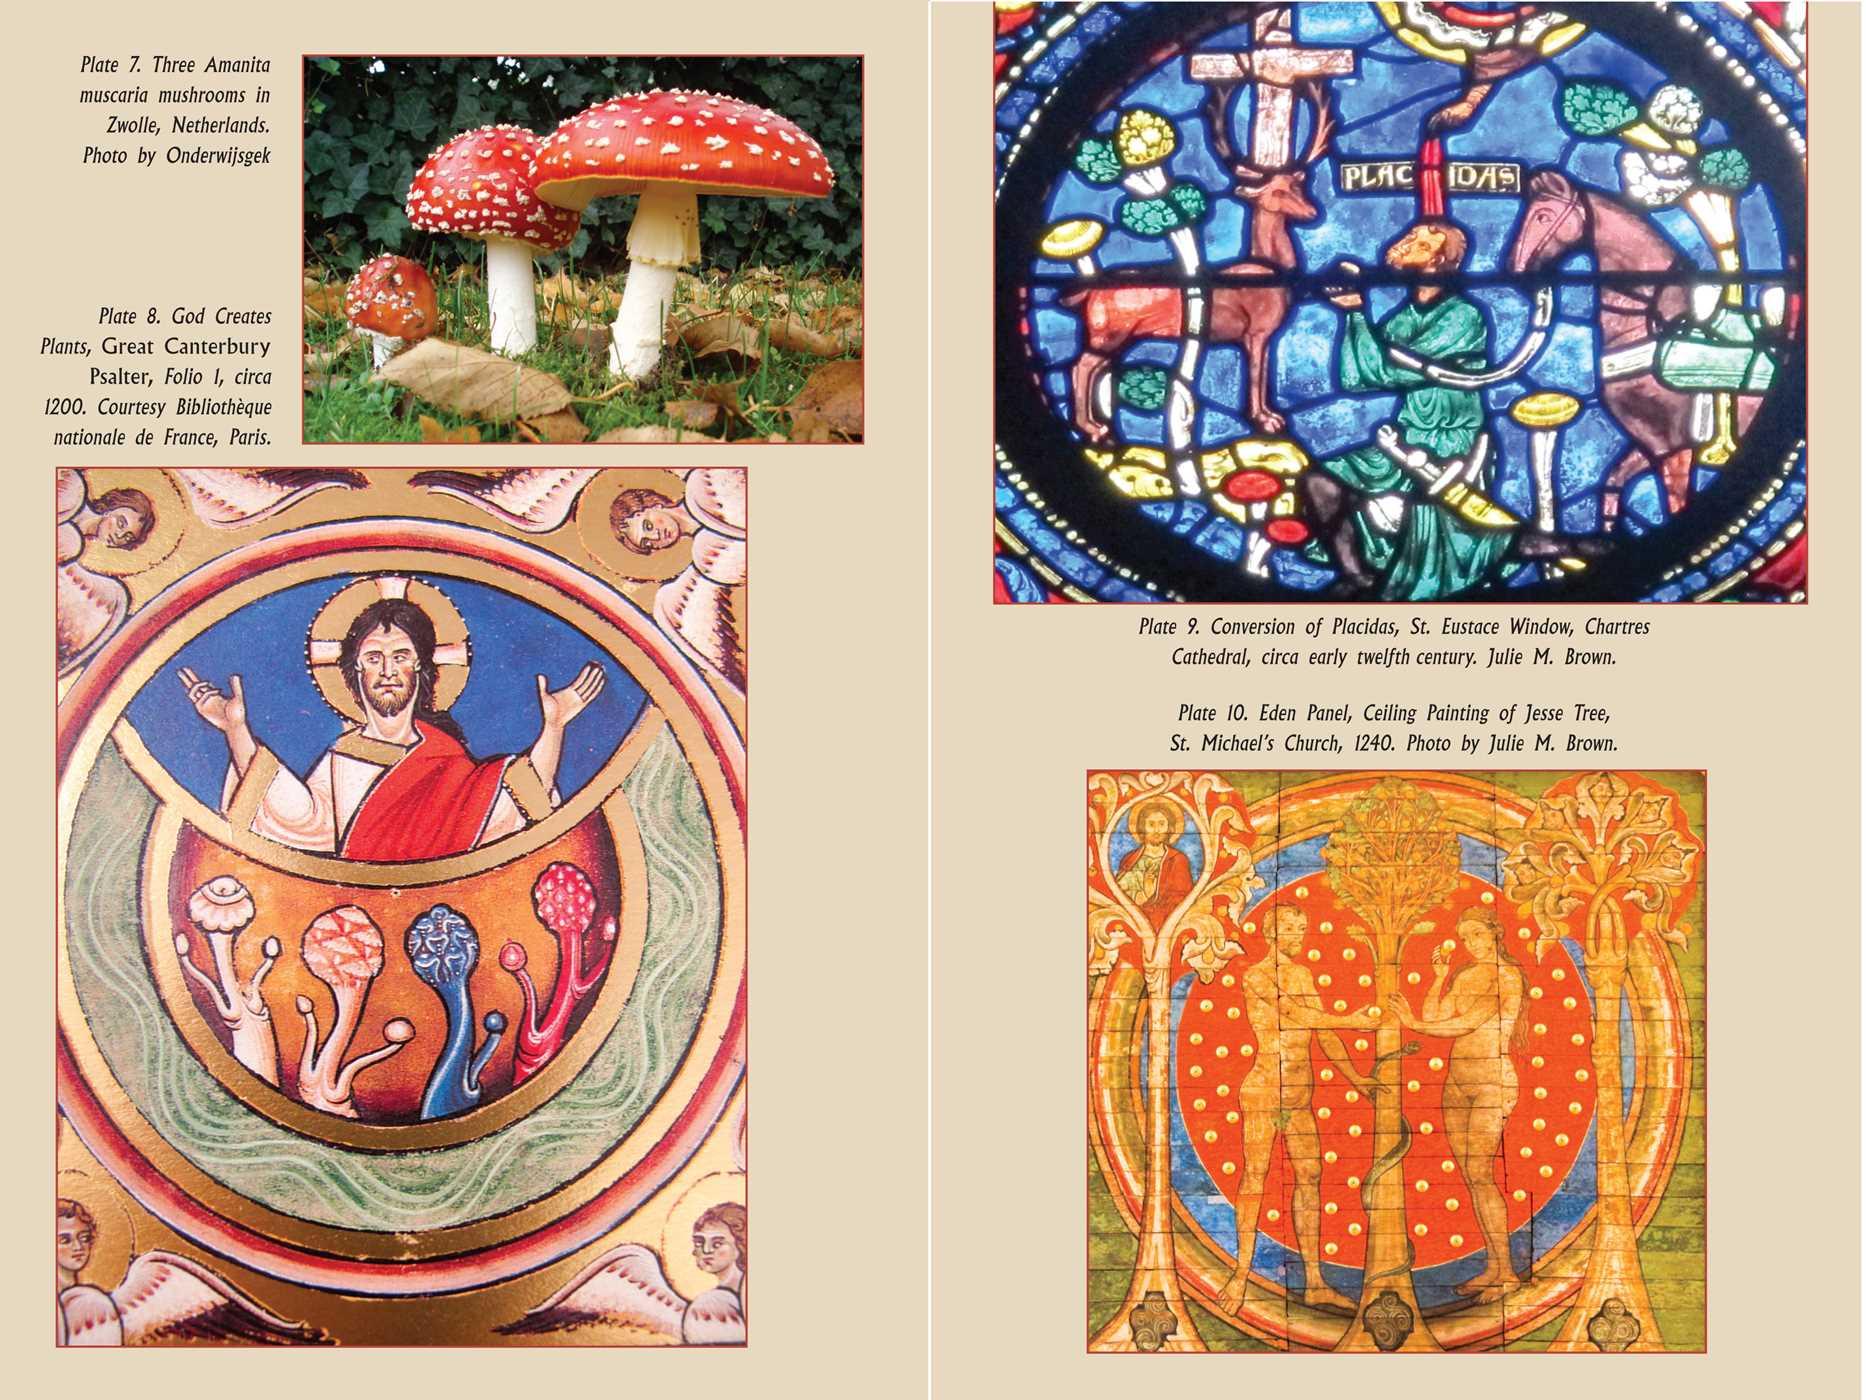 The psychedelic gospels 9781620555026.in05